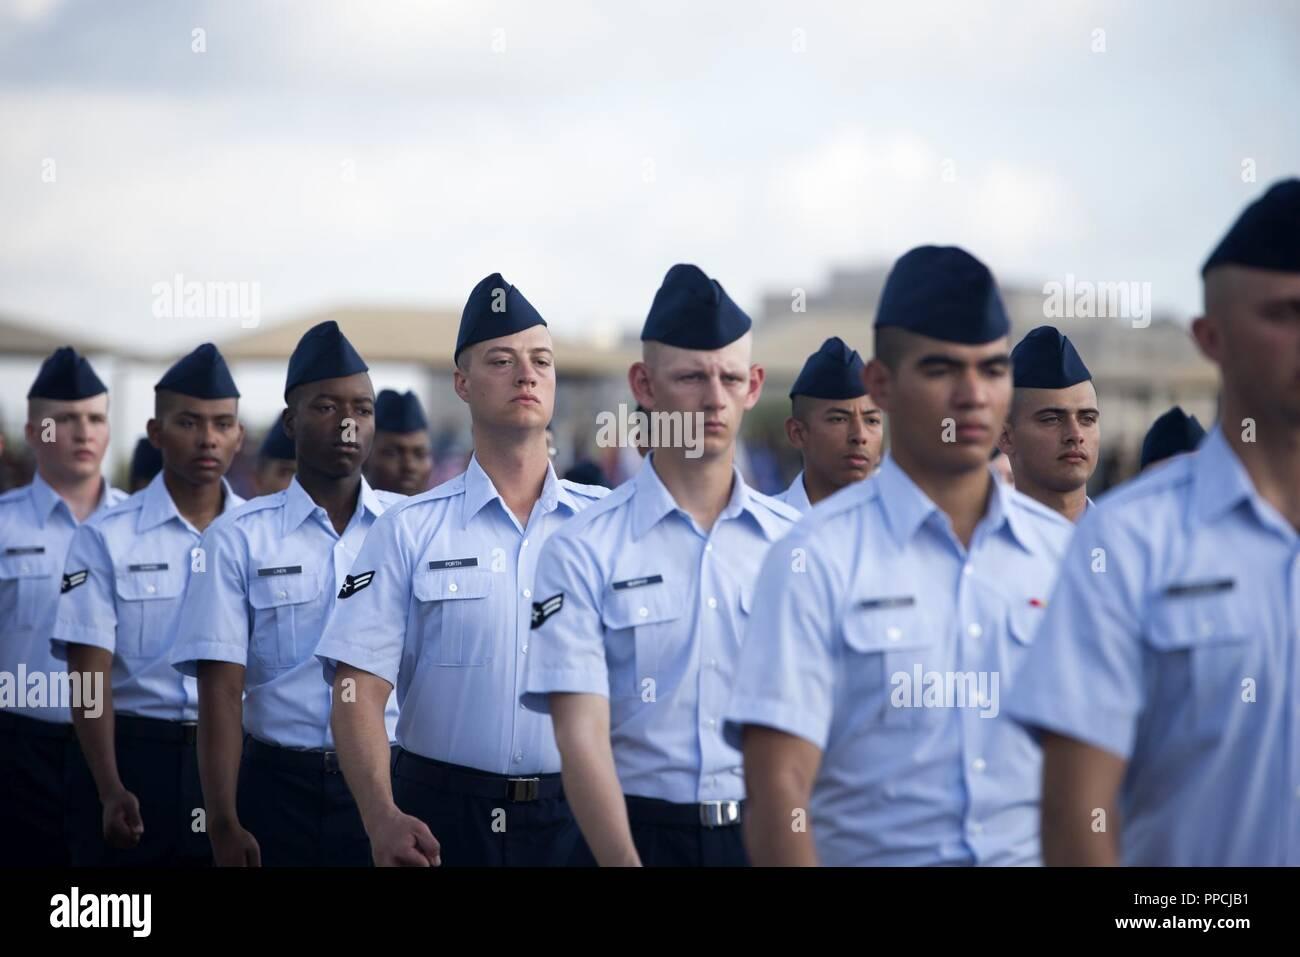 Air Force Graduation >> U S Air Force Airmen March During Their Basic Military Training